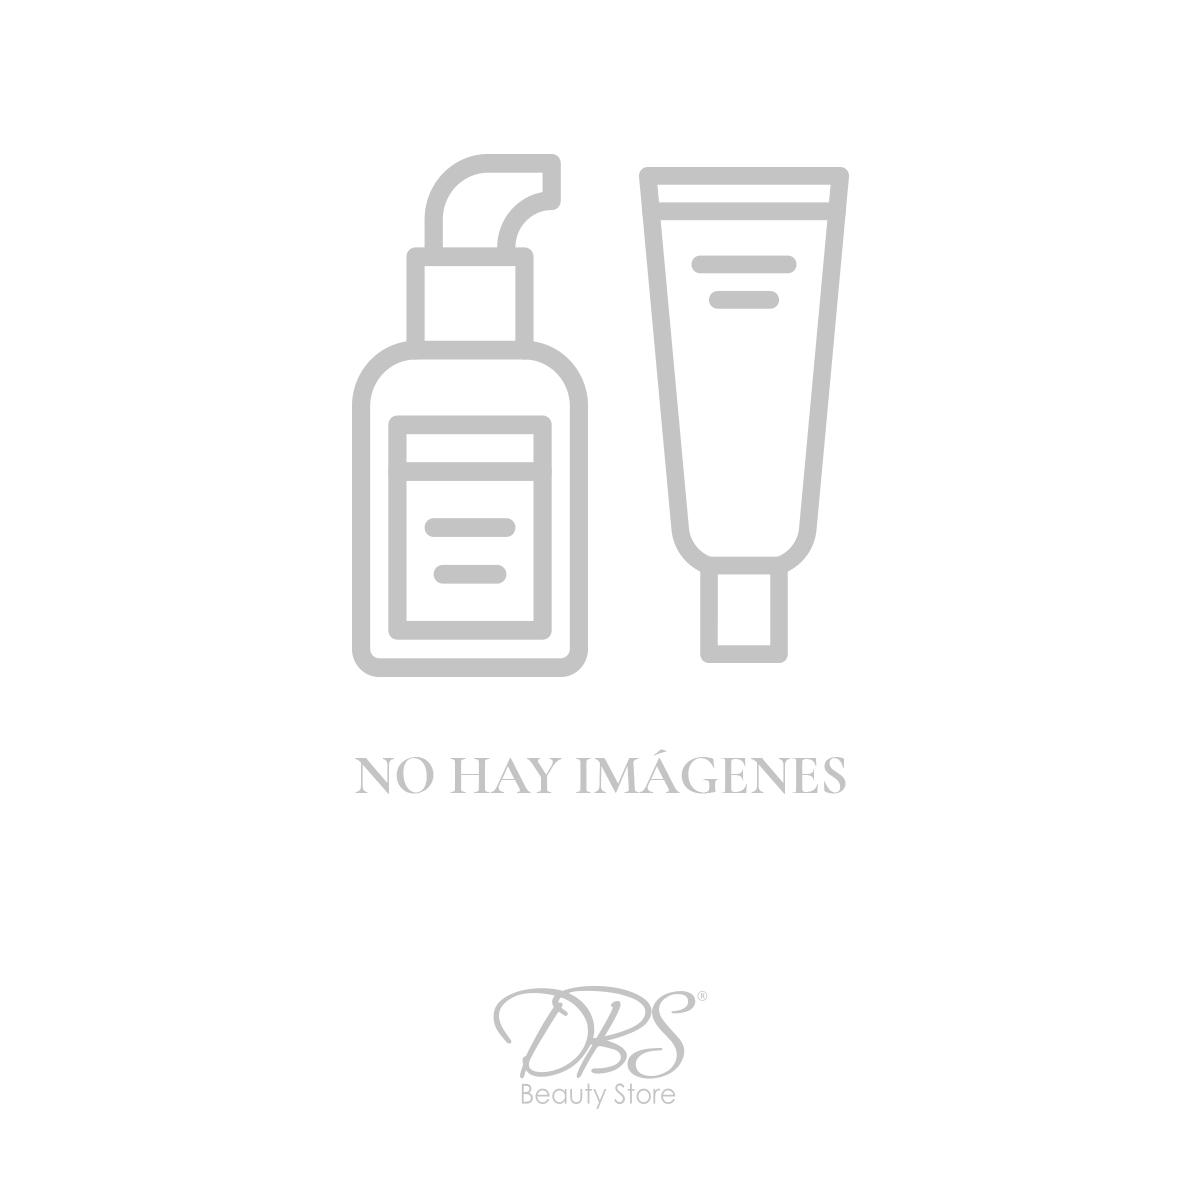 body-luxuries-BL-XC1839-MP.jpg